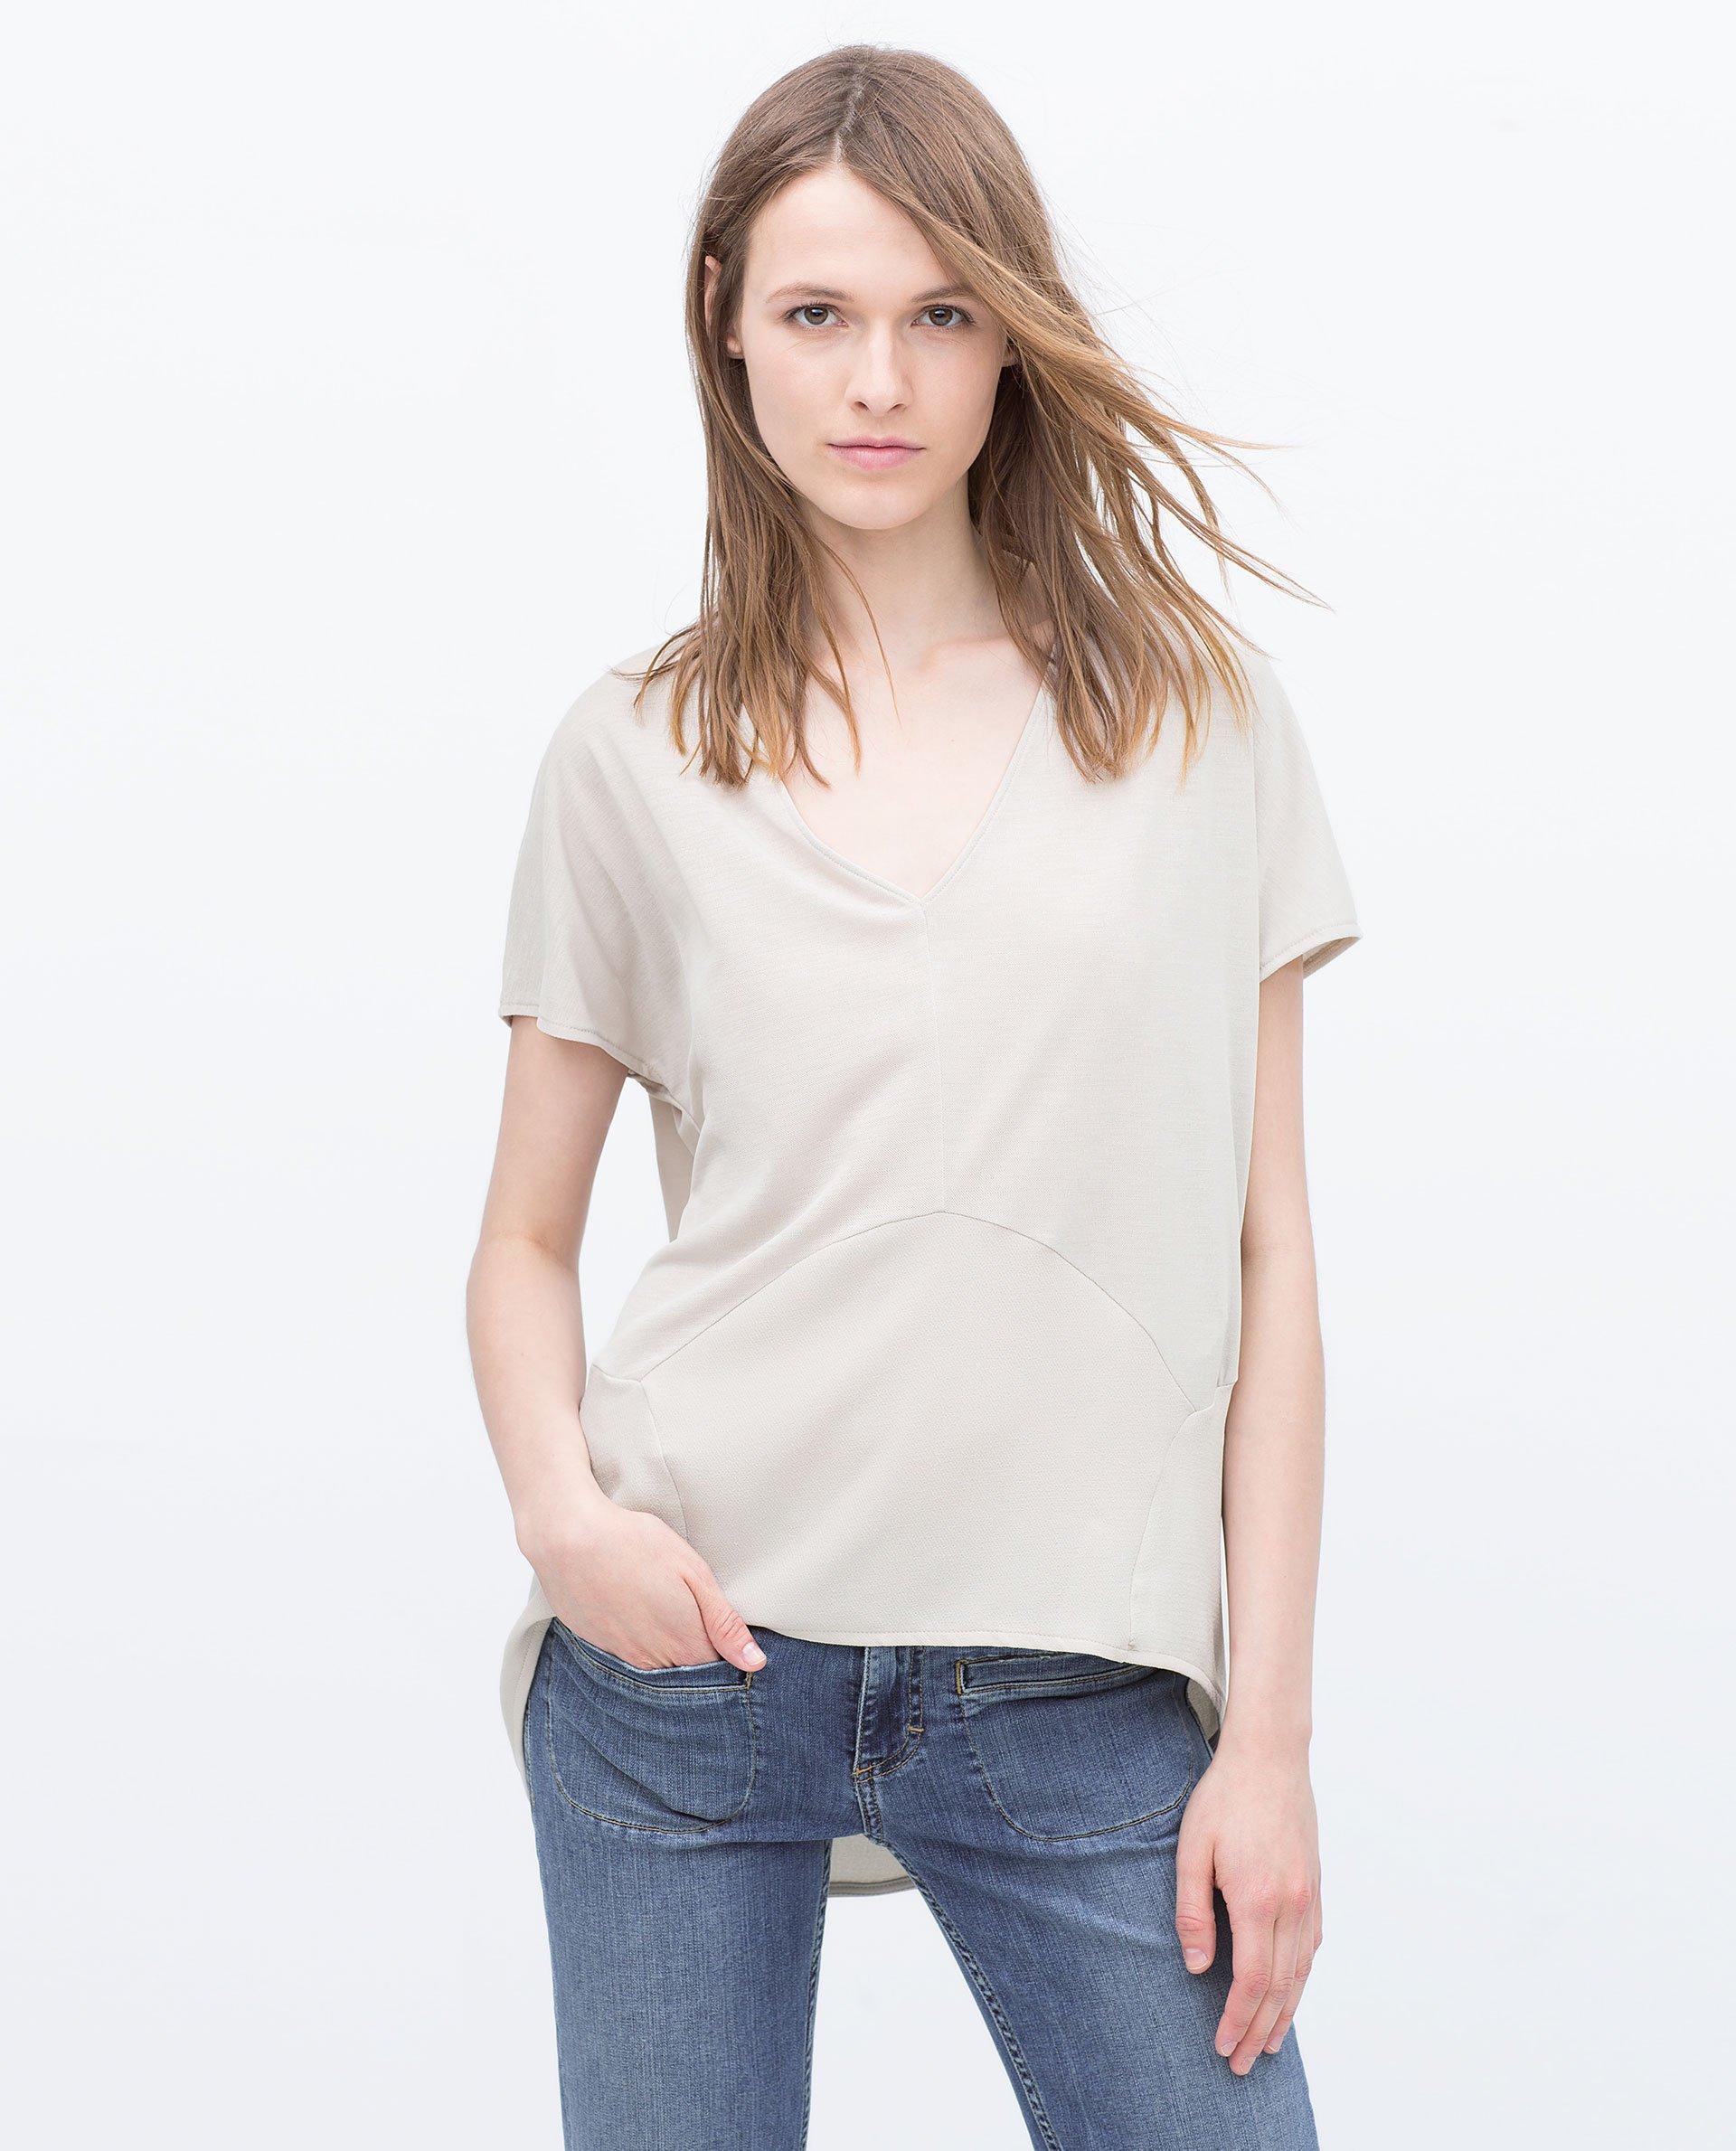 Zara Shirt Blouse 88